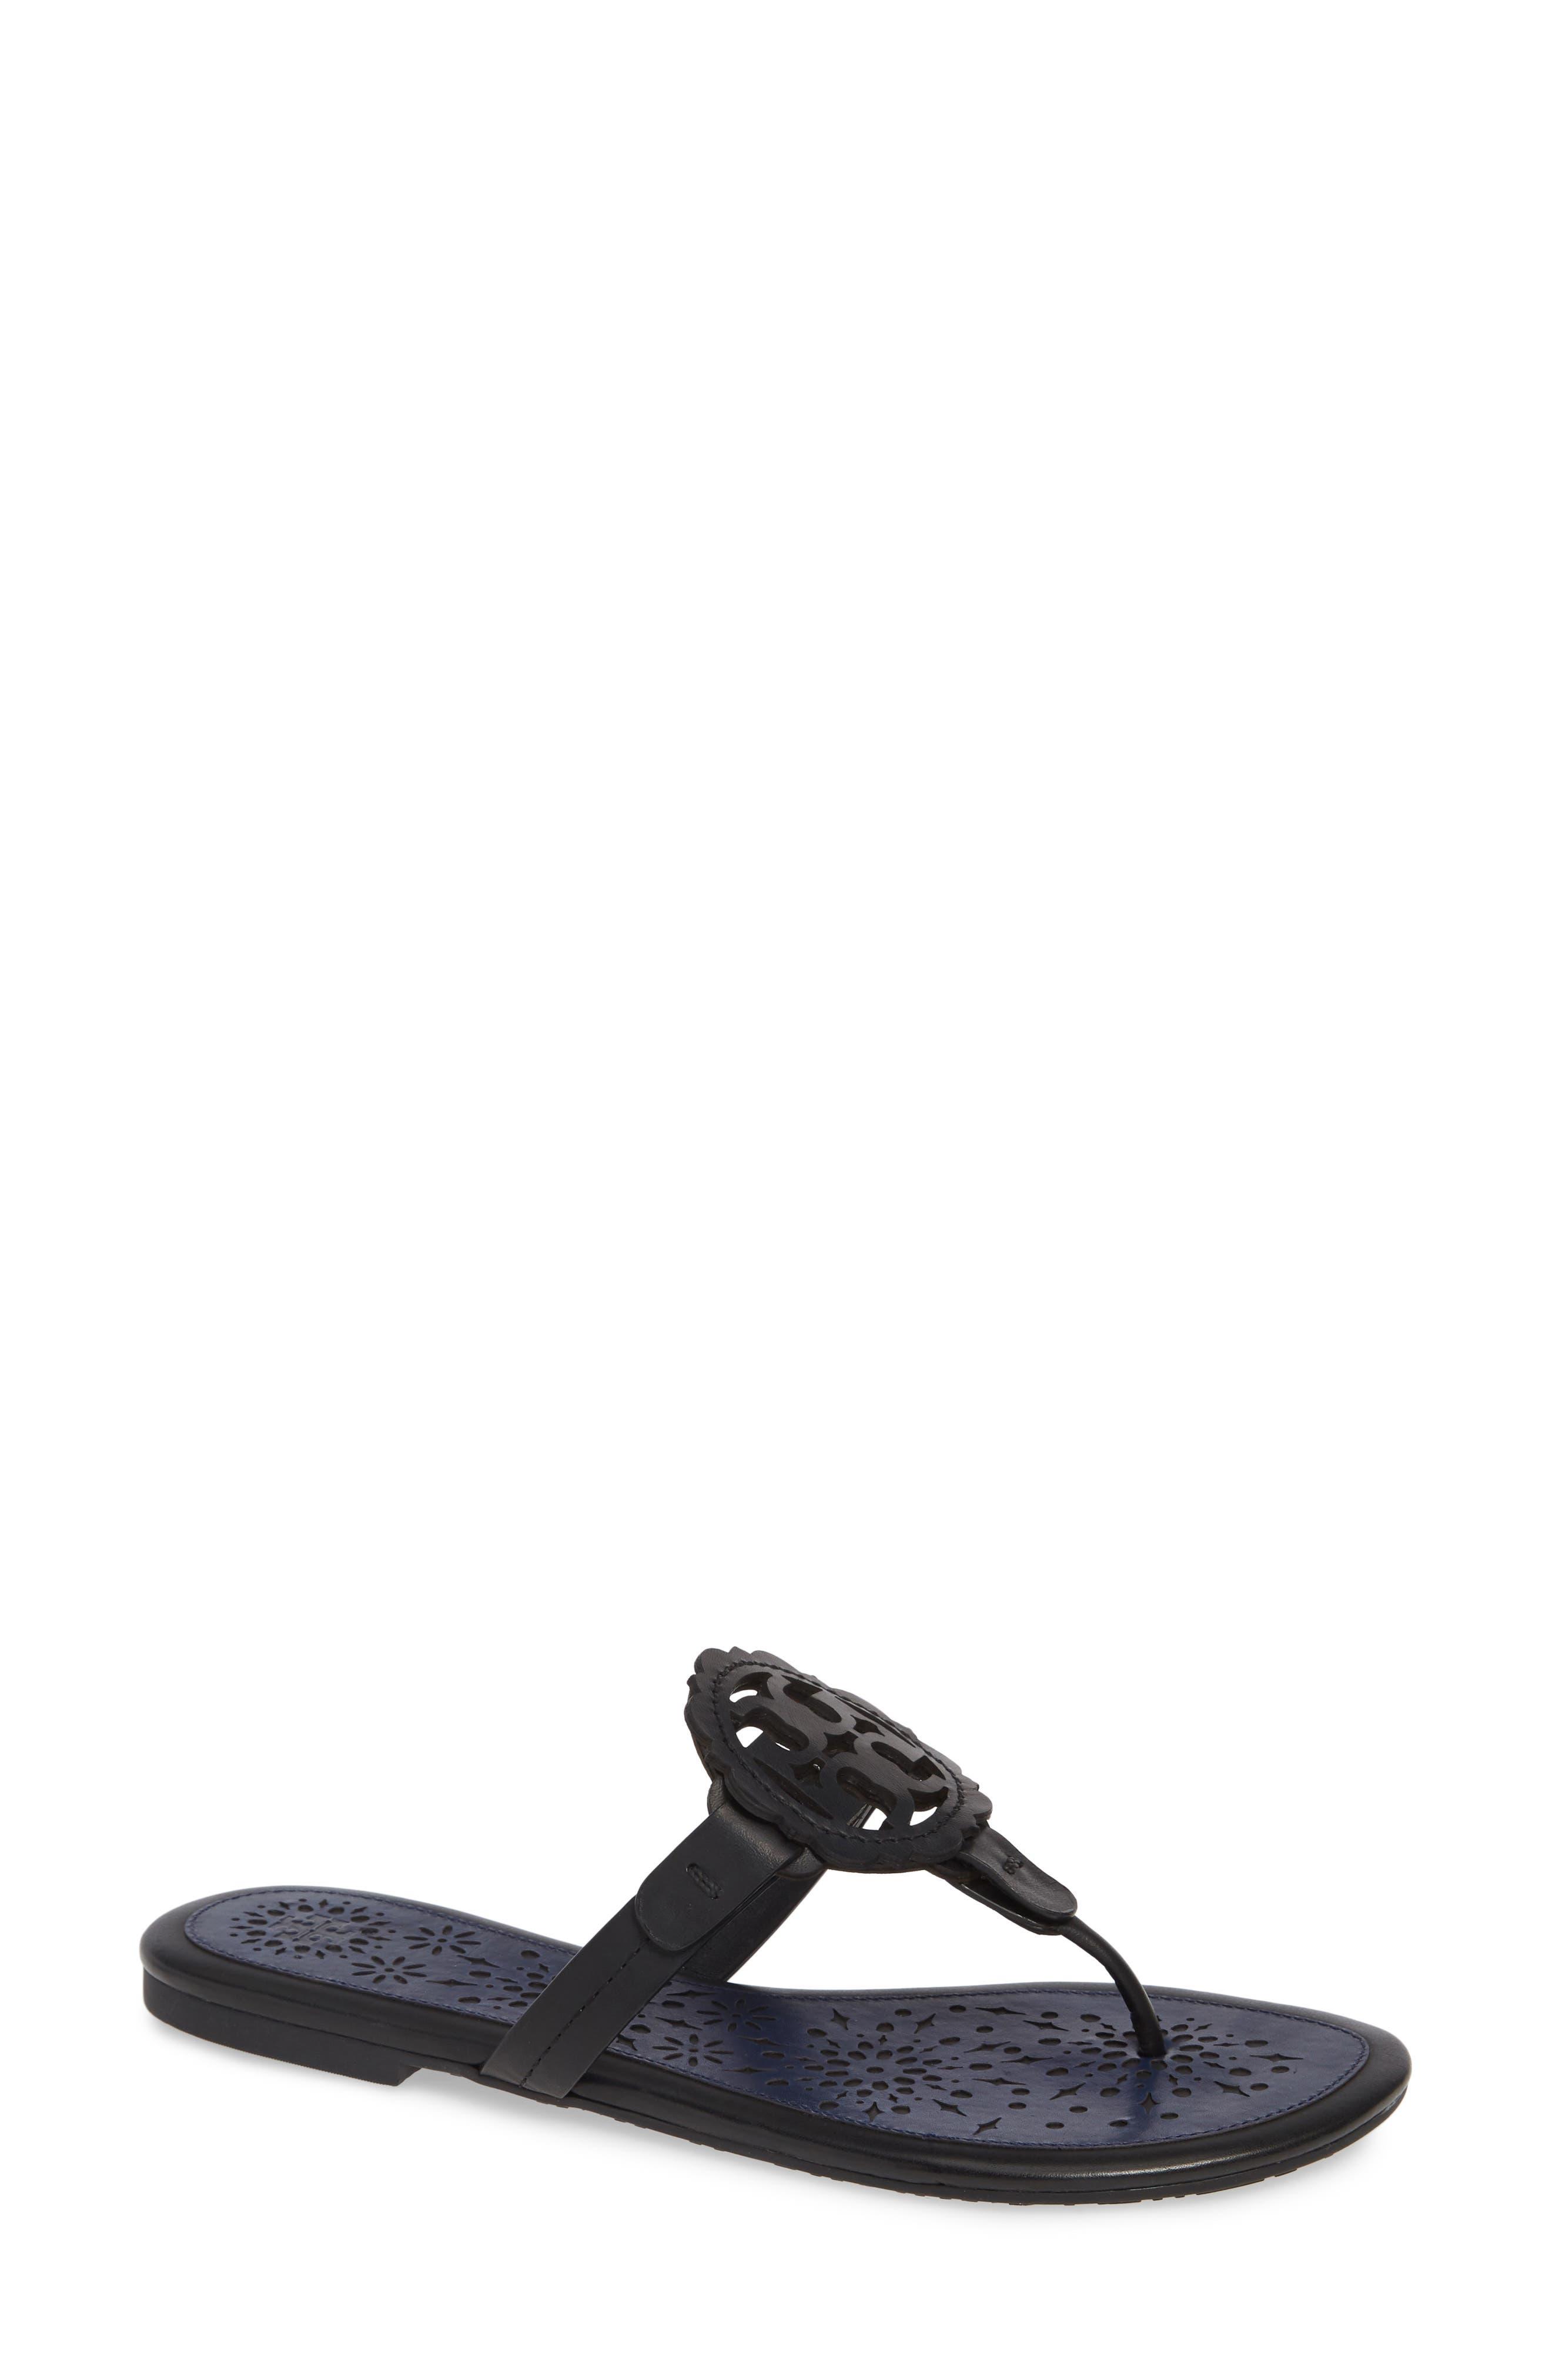 Miller Scalloped Medallion Sandal,                             Main thumbnail 1, color,                             PERFECT BLACK/ PERFECT NAVY